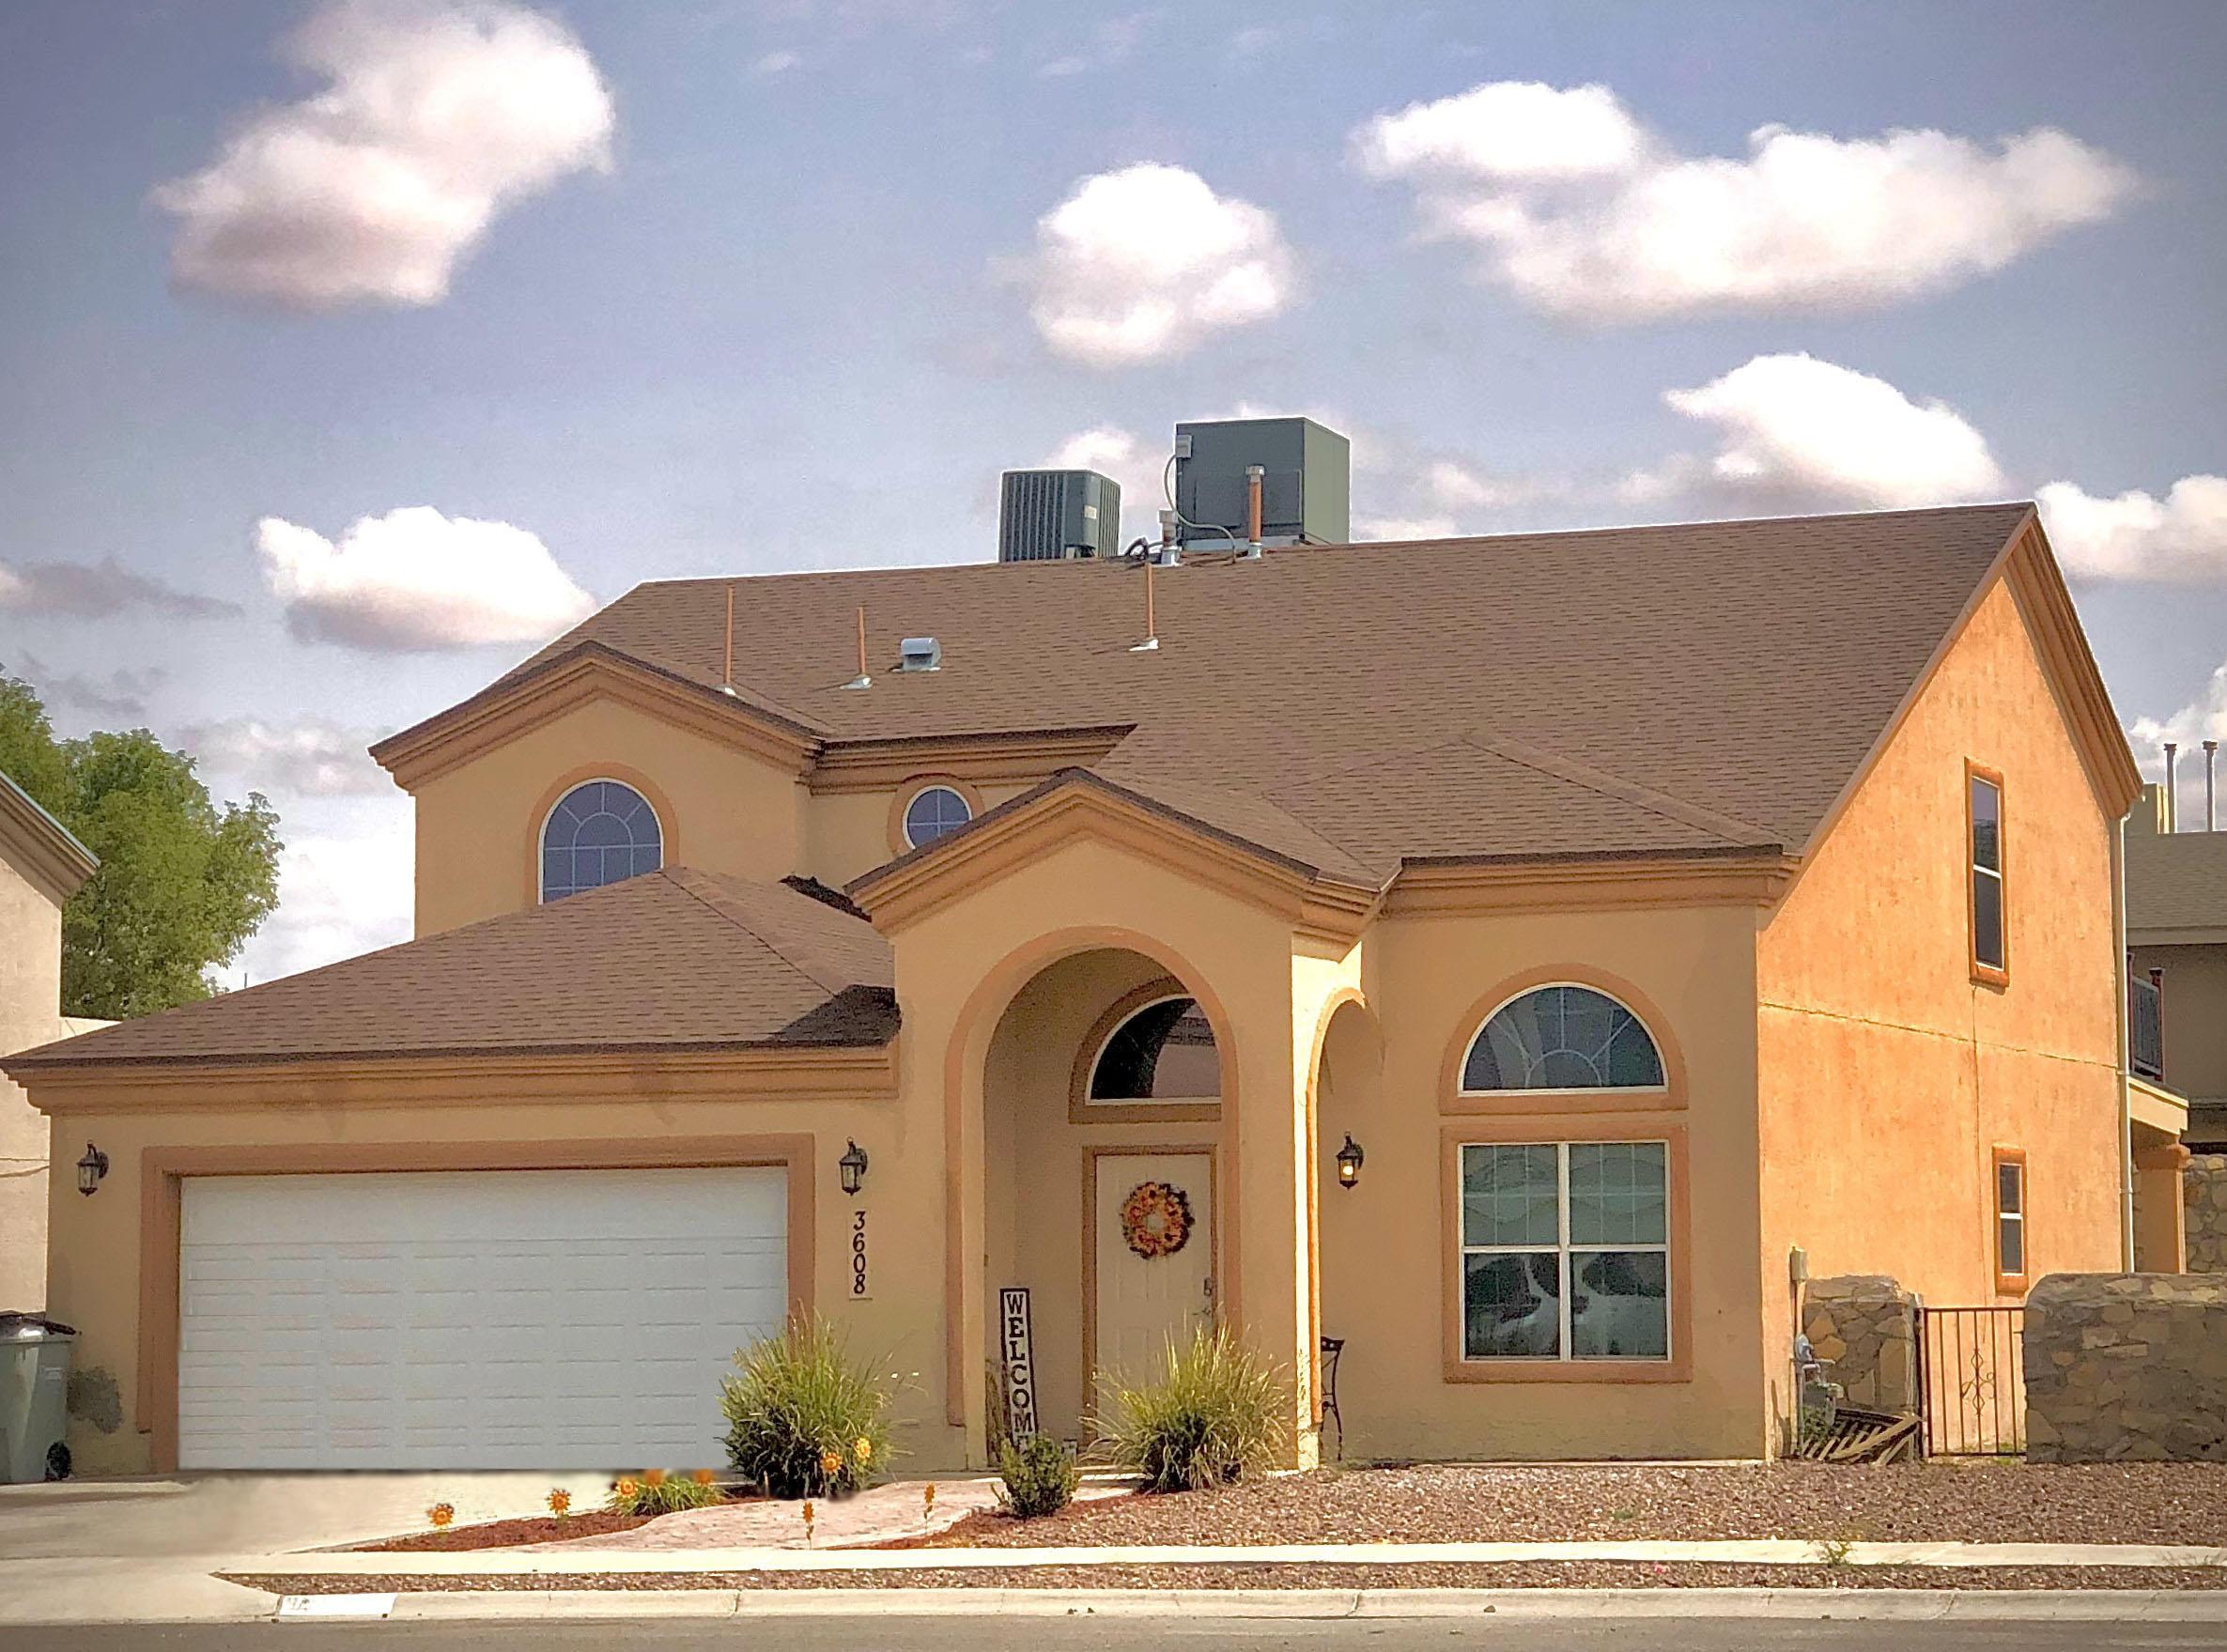 3608 VITEX, El Paso, Texas 79936, 5 Bedrooms Bedrooms, ,3 BathroomsBathrooms,Residential,For sale,VITEX,834819